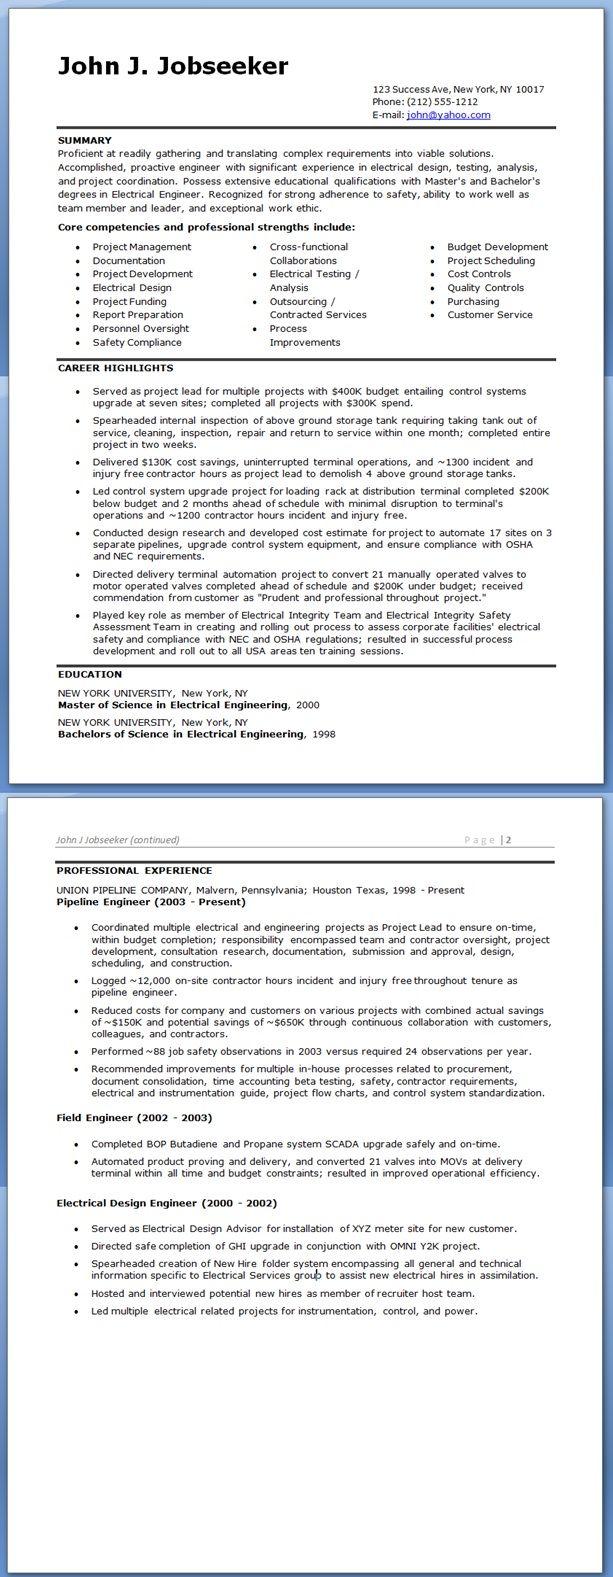 Electrical Engineer Resume Sample Doc Experienced Engineering Resume Electrical Engineering Download Resume